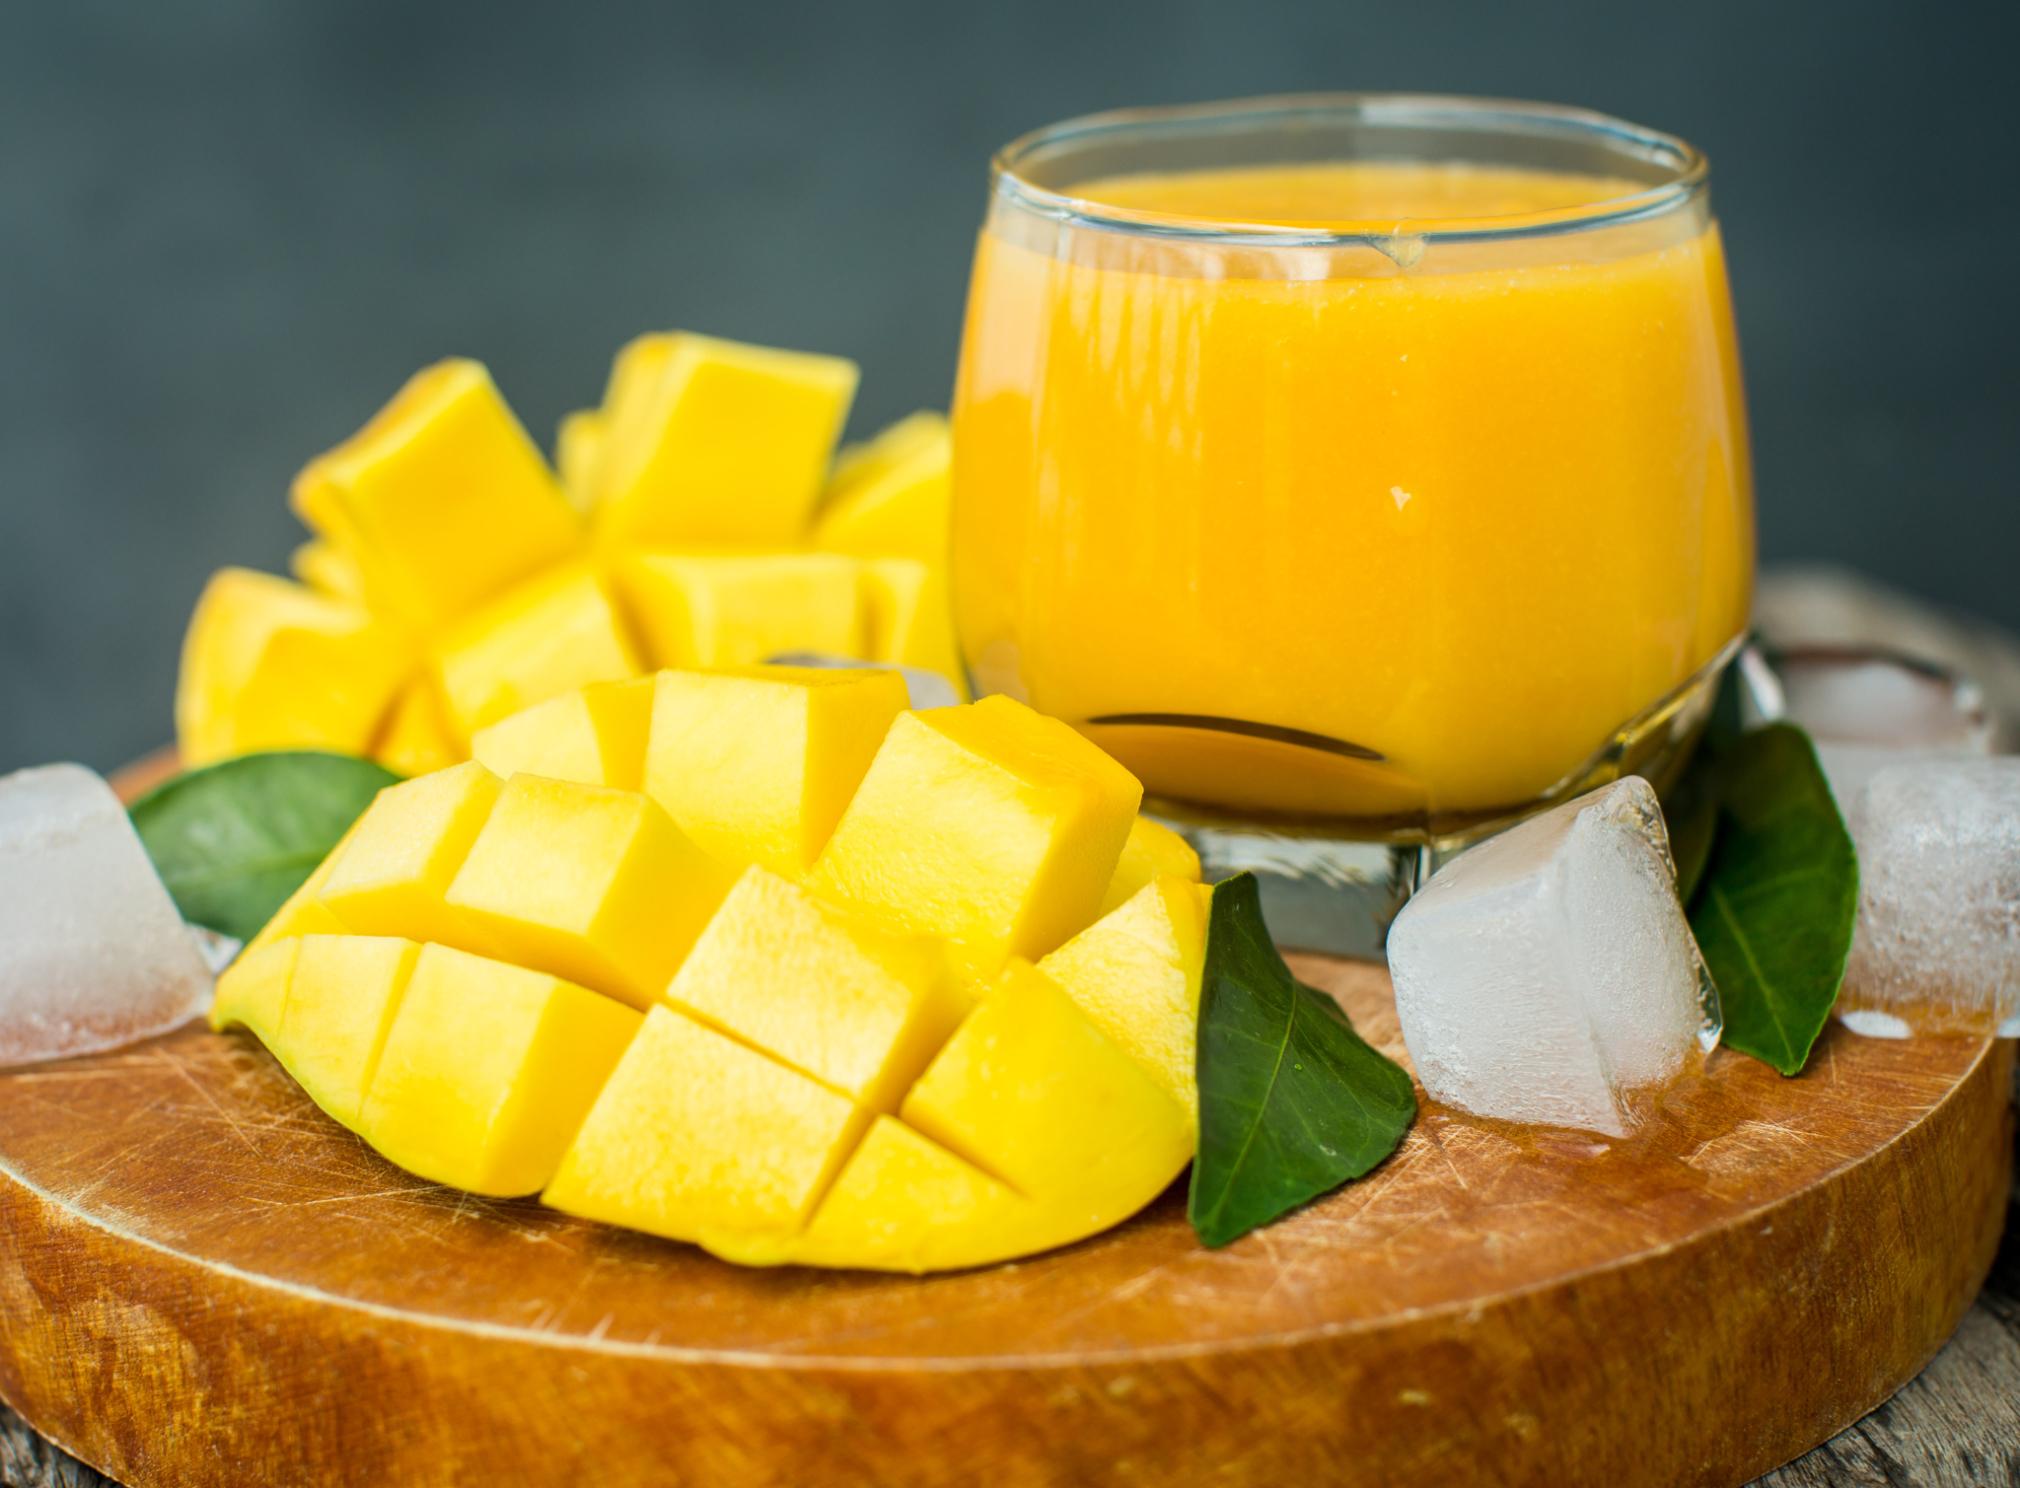 Mango: description, use. Nutritional value and calorie content of mango 34